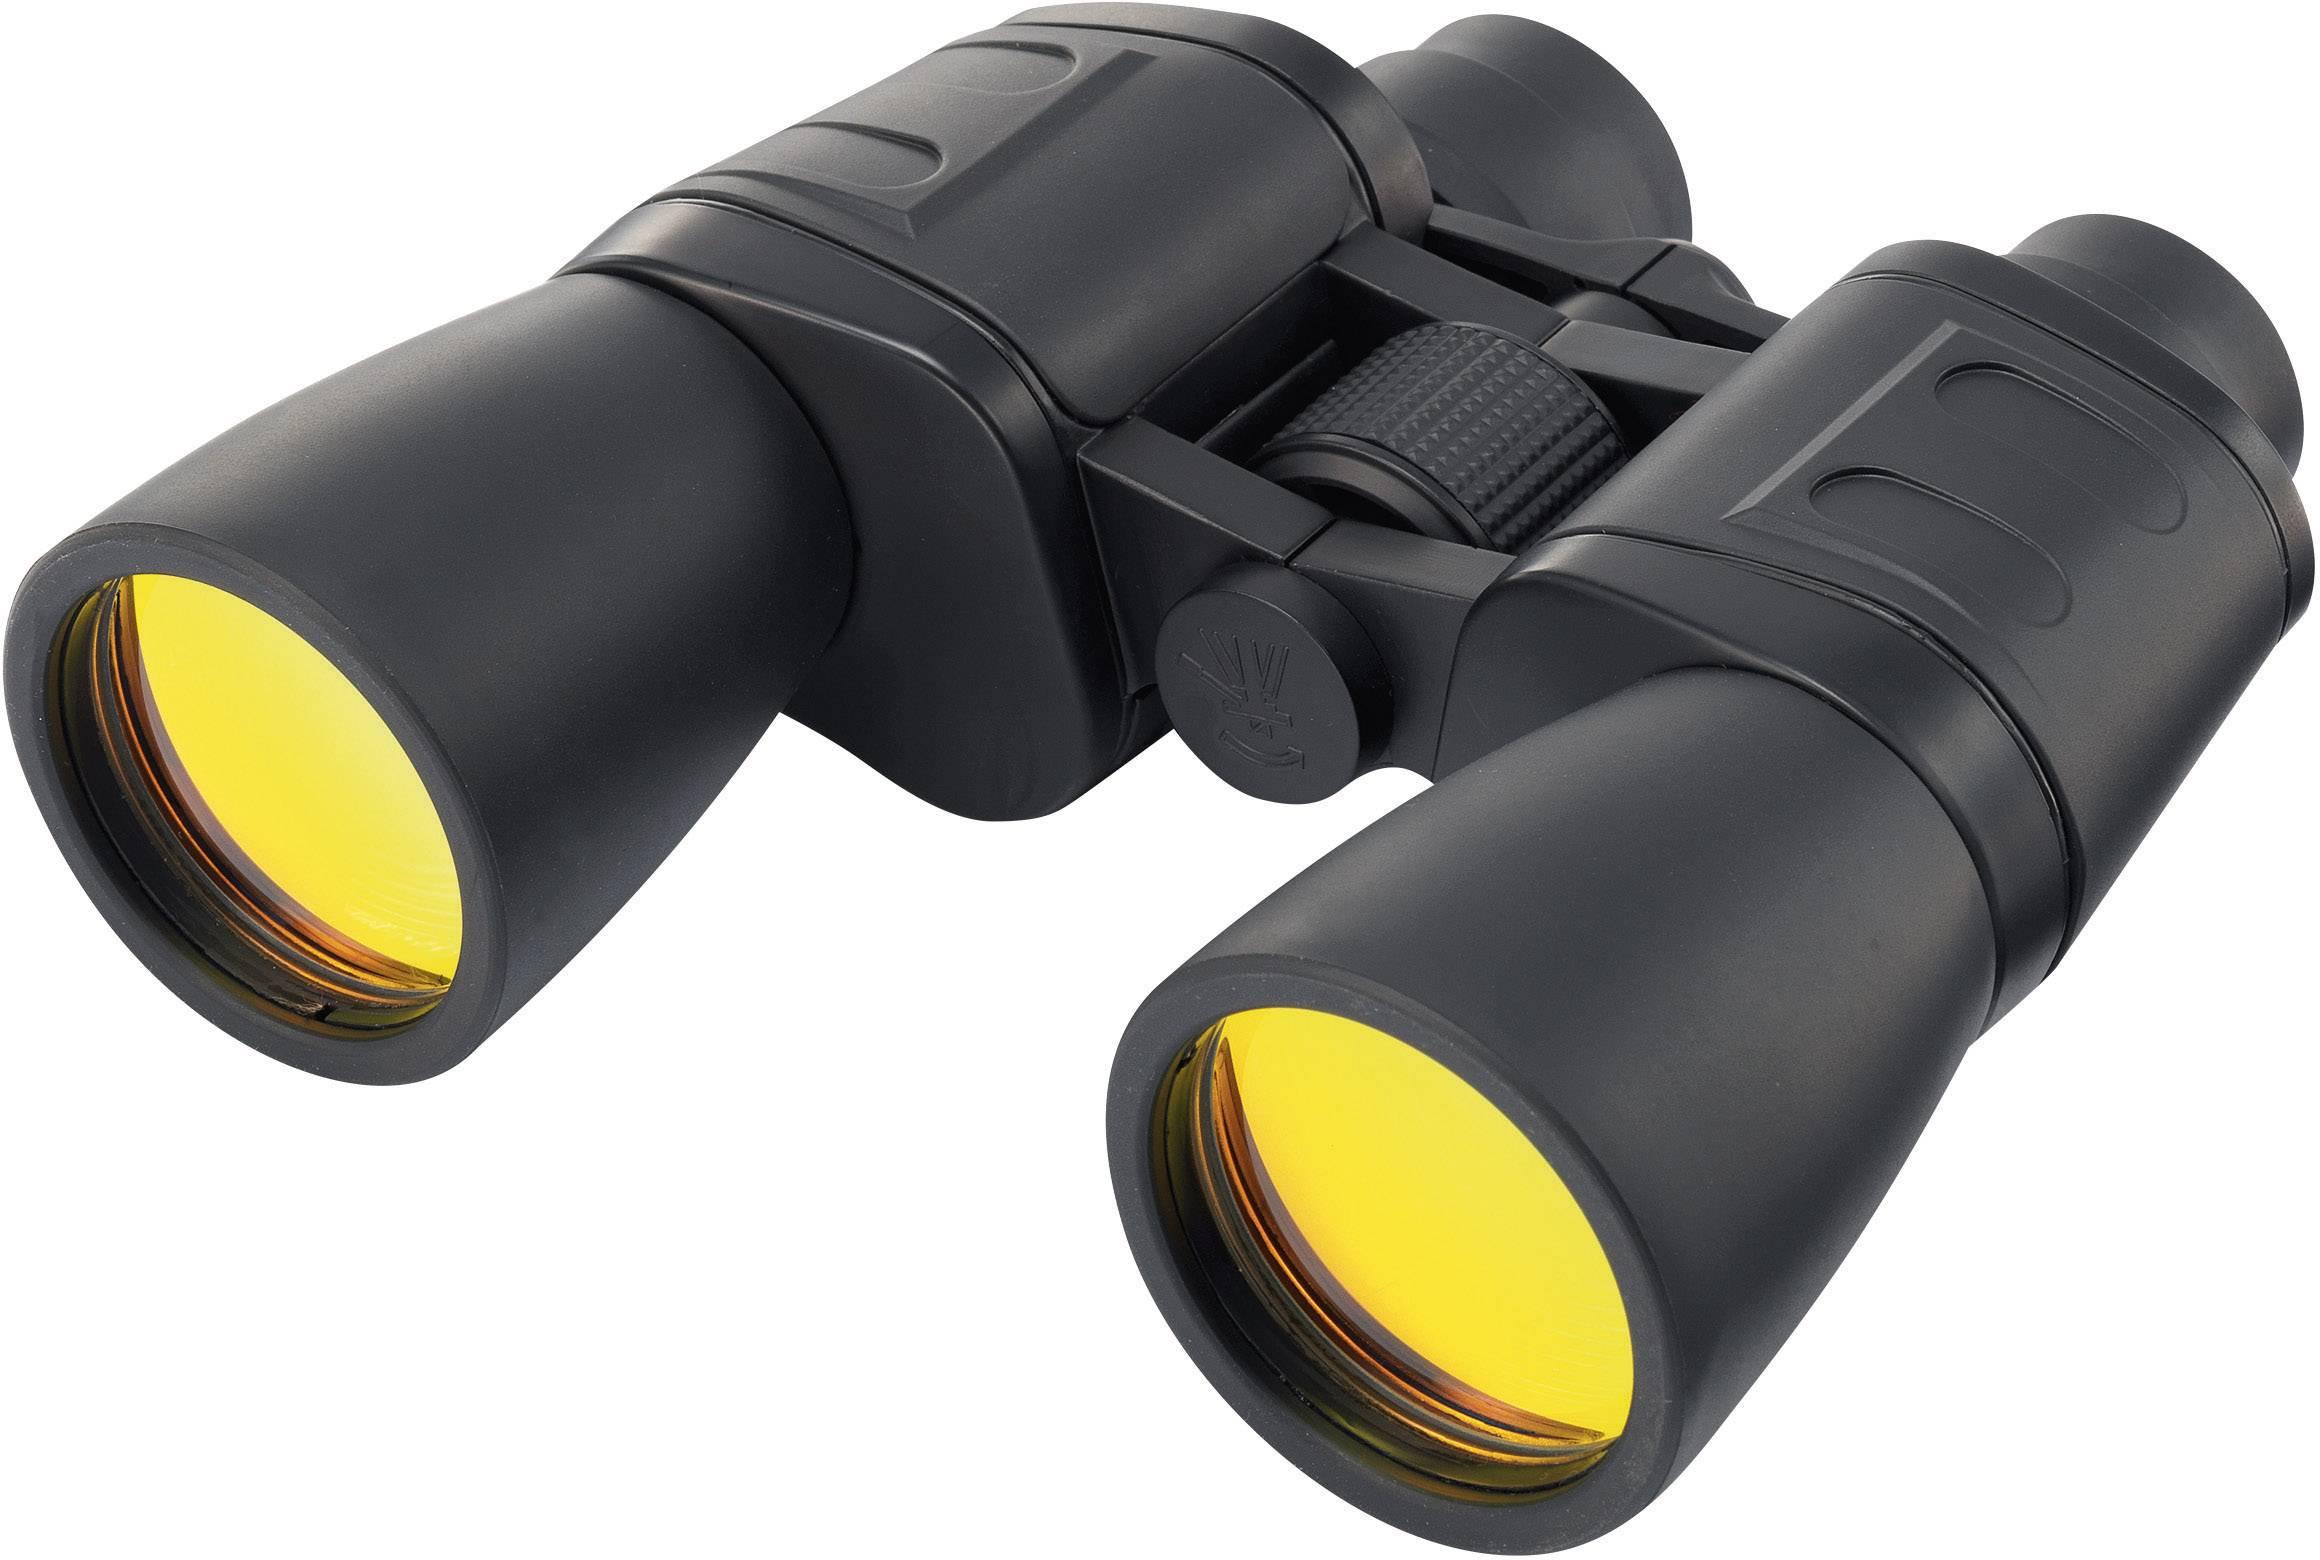 Ďalekohľad Renkforce 7x50 Binocular čierna